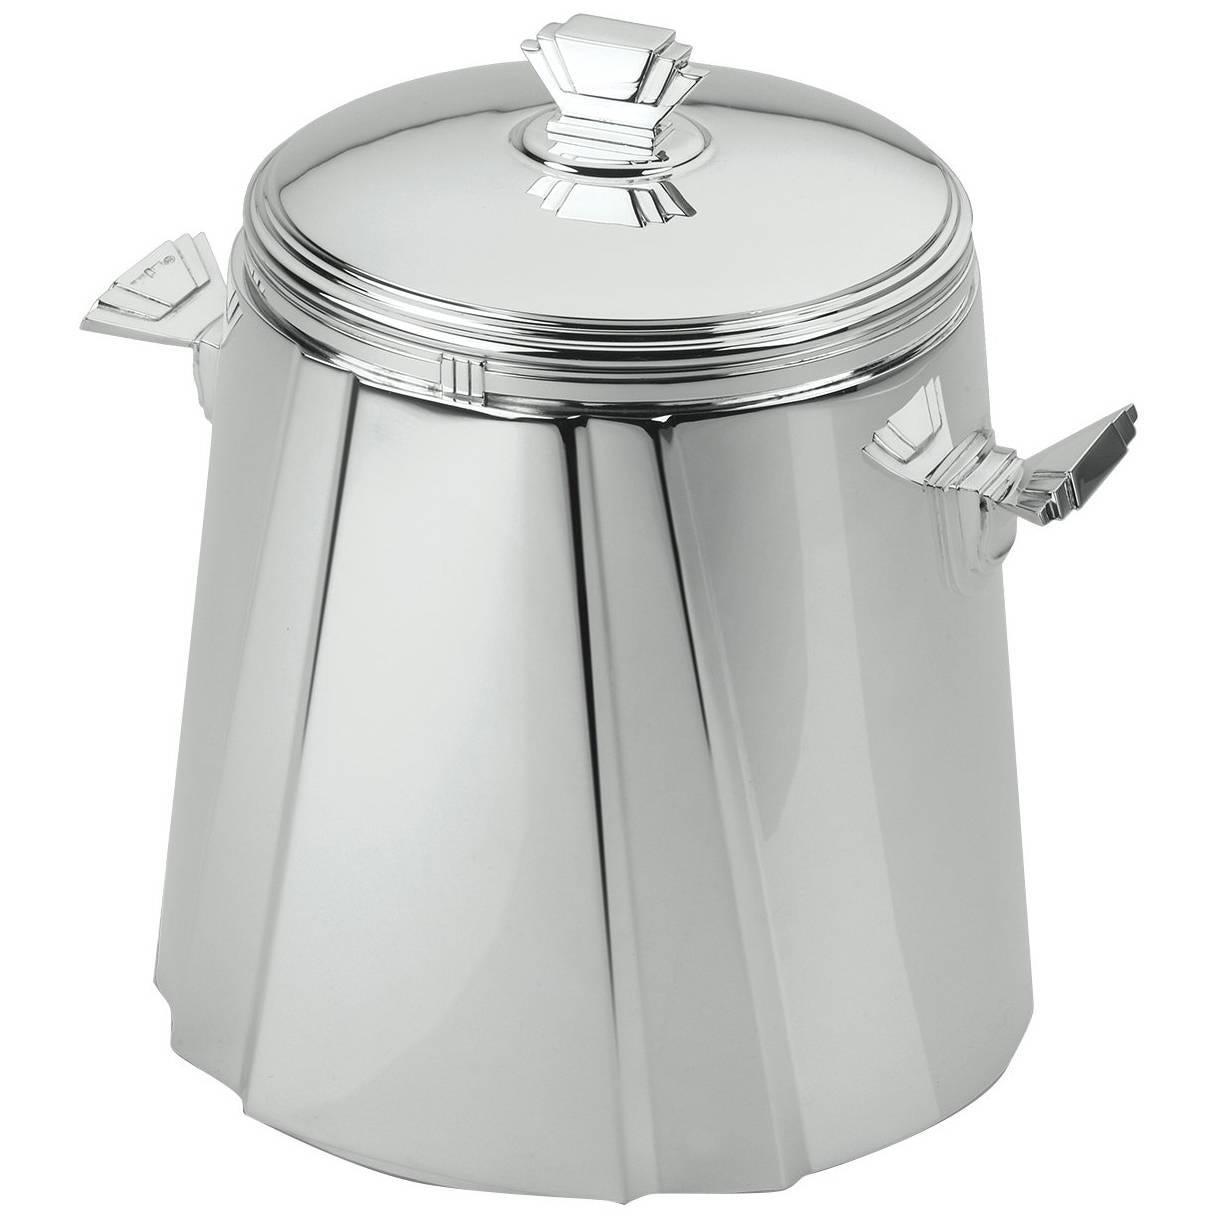 Novecento Ice Bucket with Lid